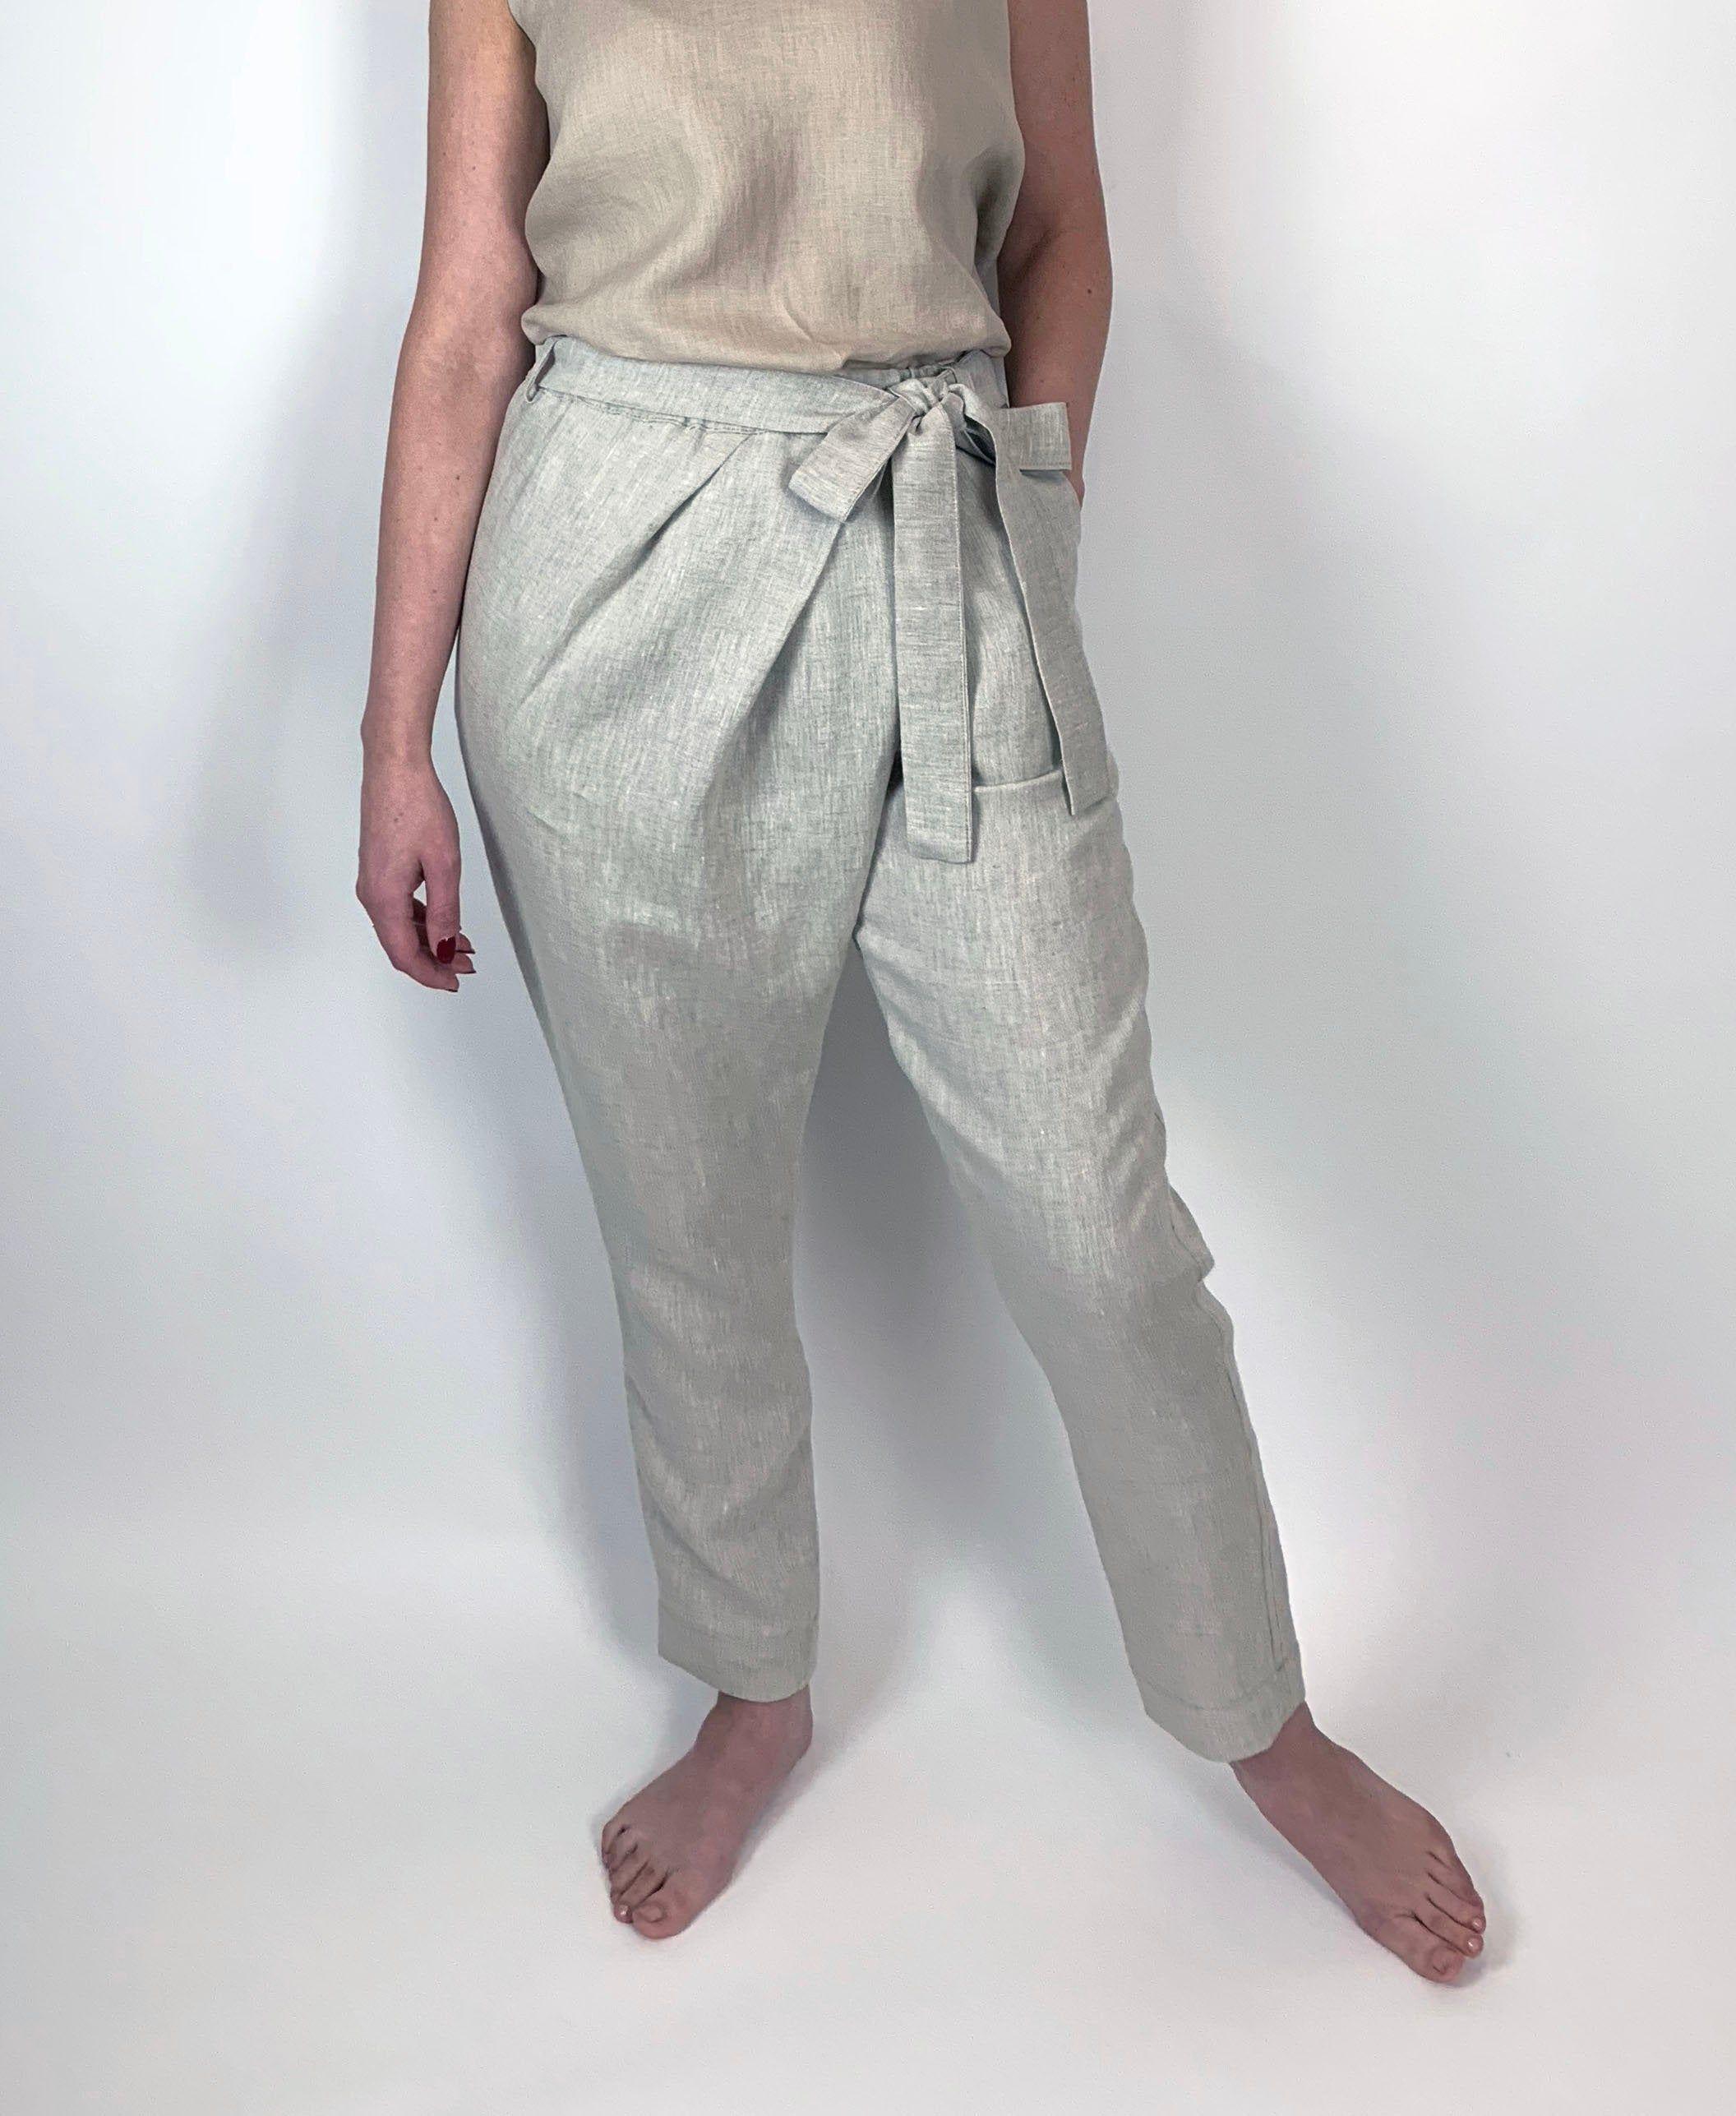 Linen pants minimalist cream relaxed fit summer straight leg XLXXL